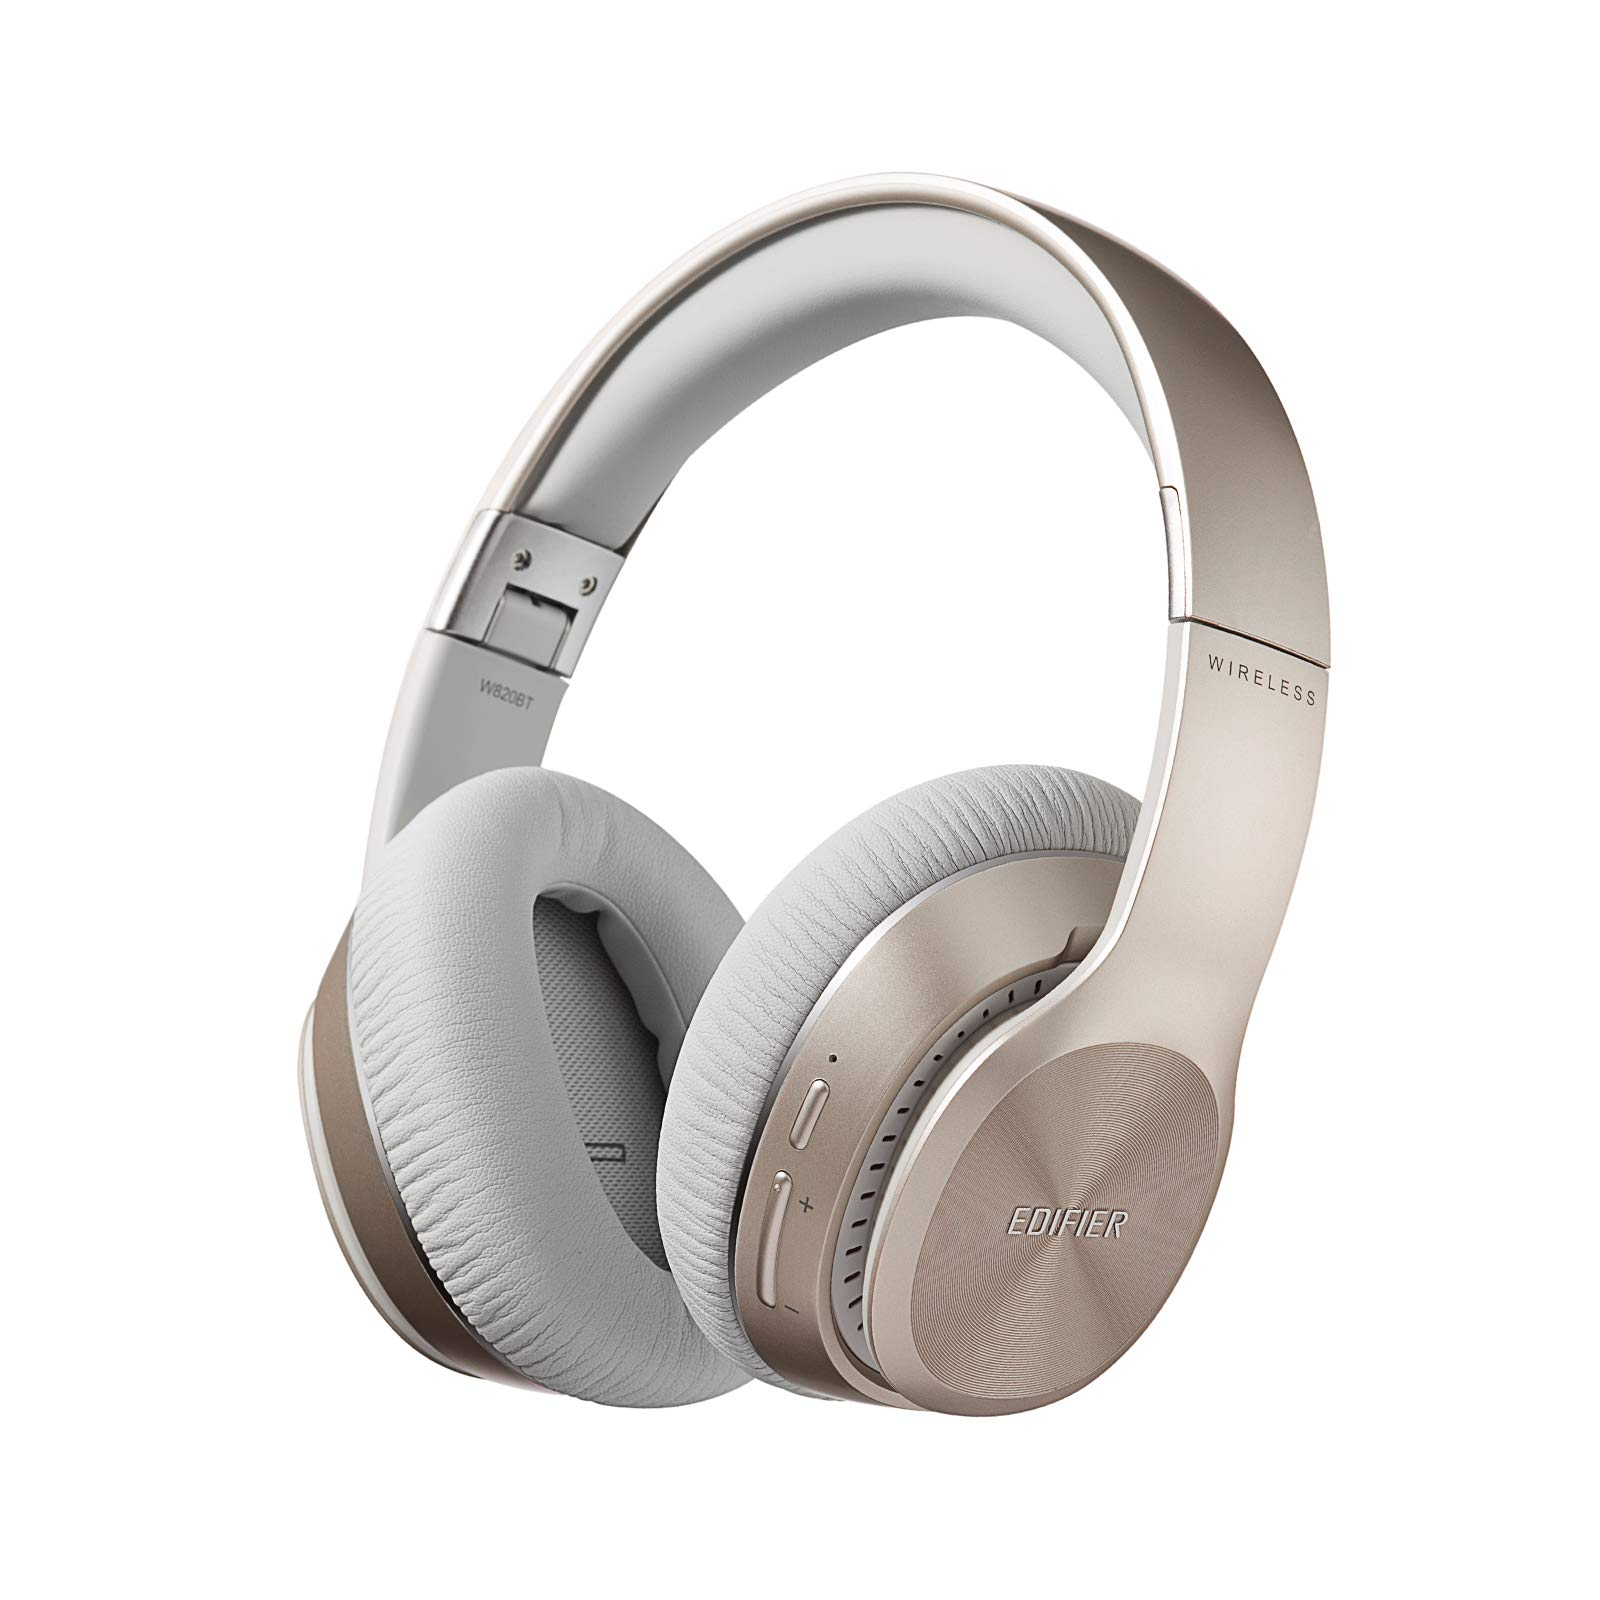 Edifier W820BT Bluetooth Headphones - Foldable Wireless Headphone with 80-Hour Long Battery Life - Gold